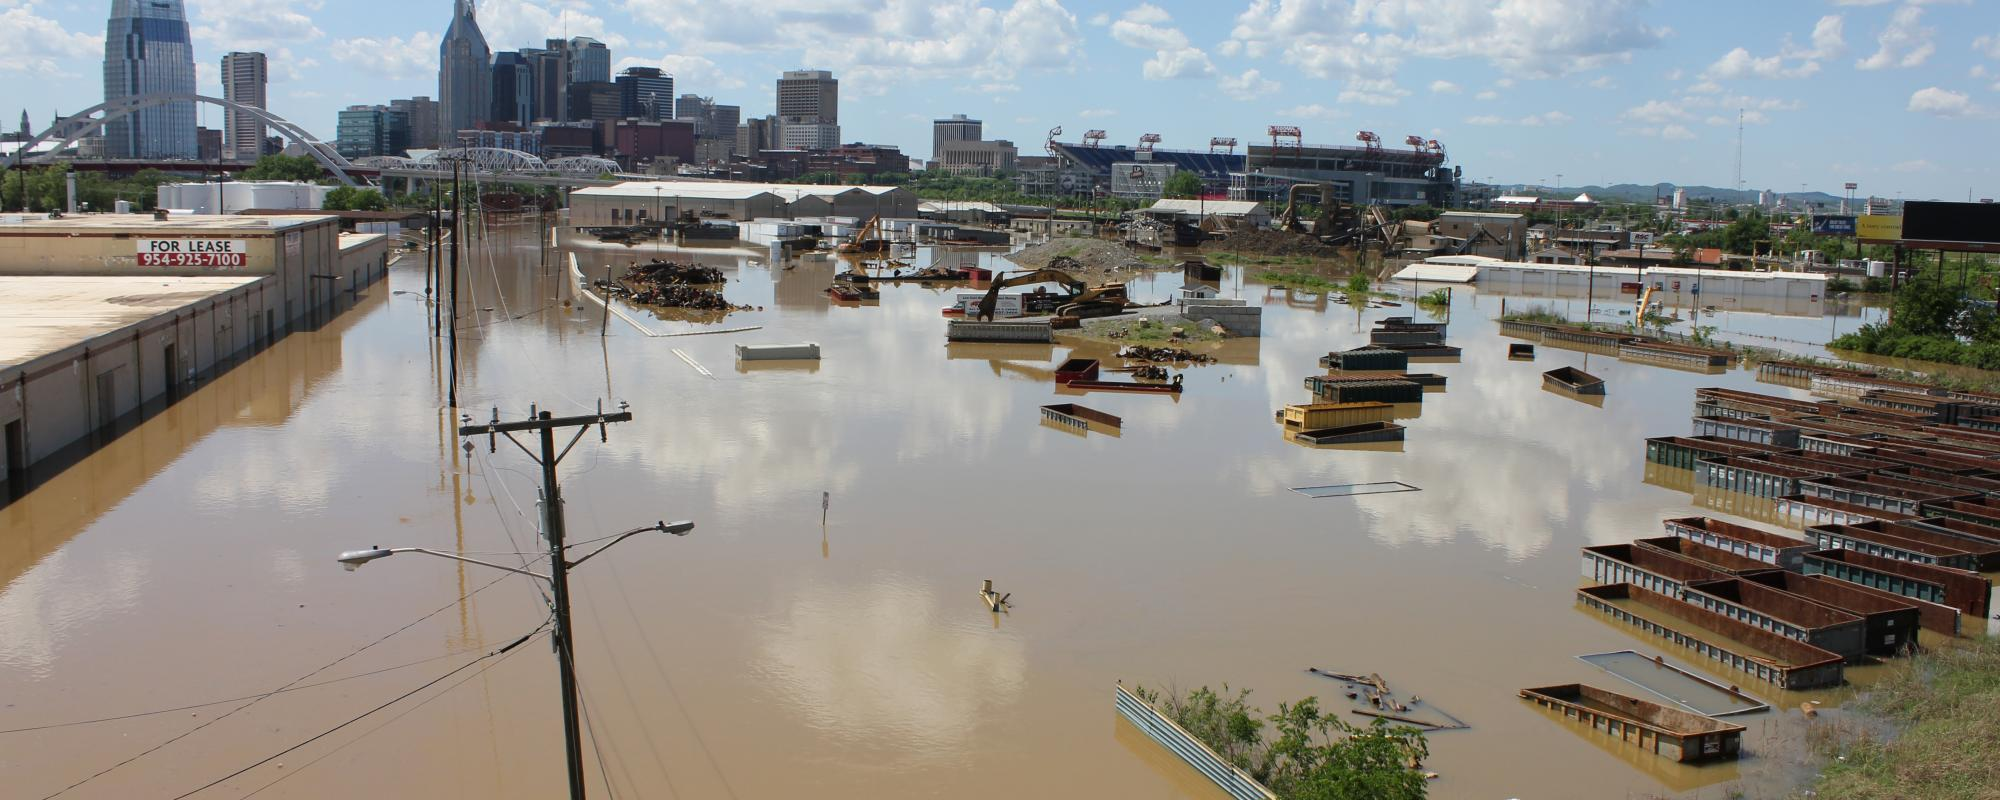 Kaldari Nashville Flood